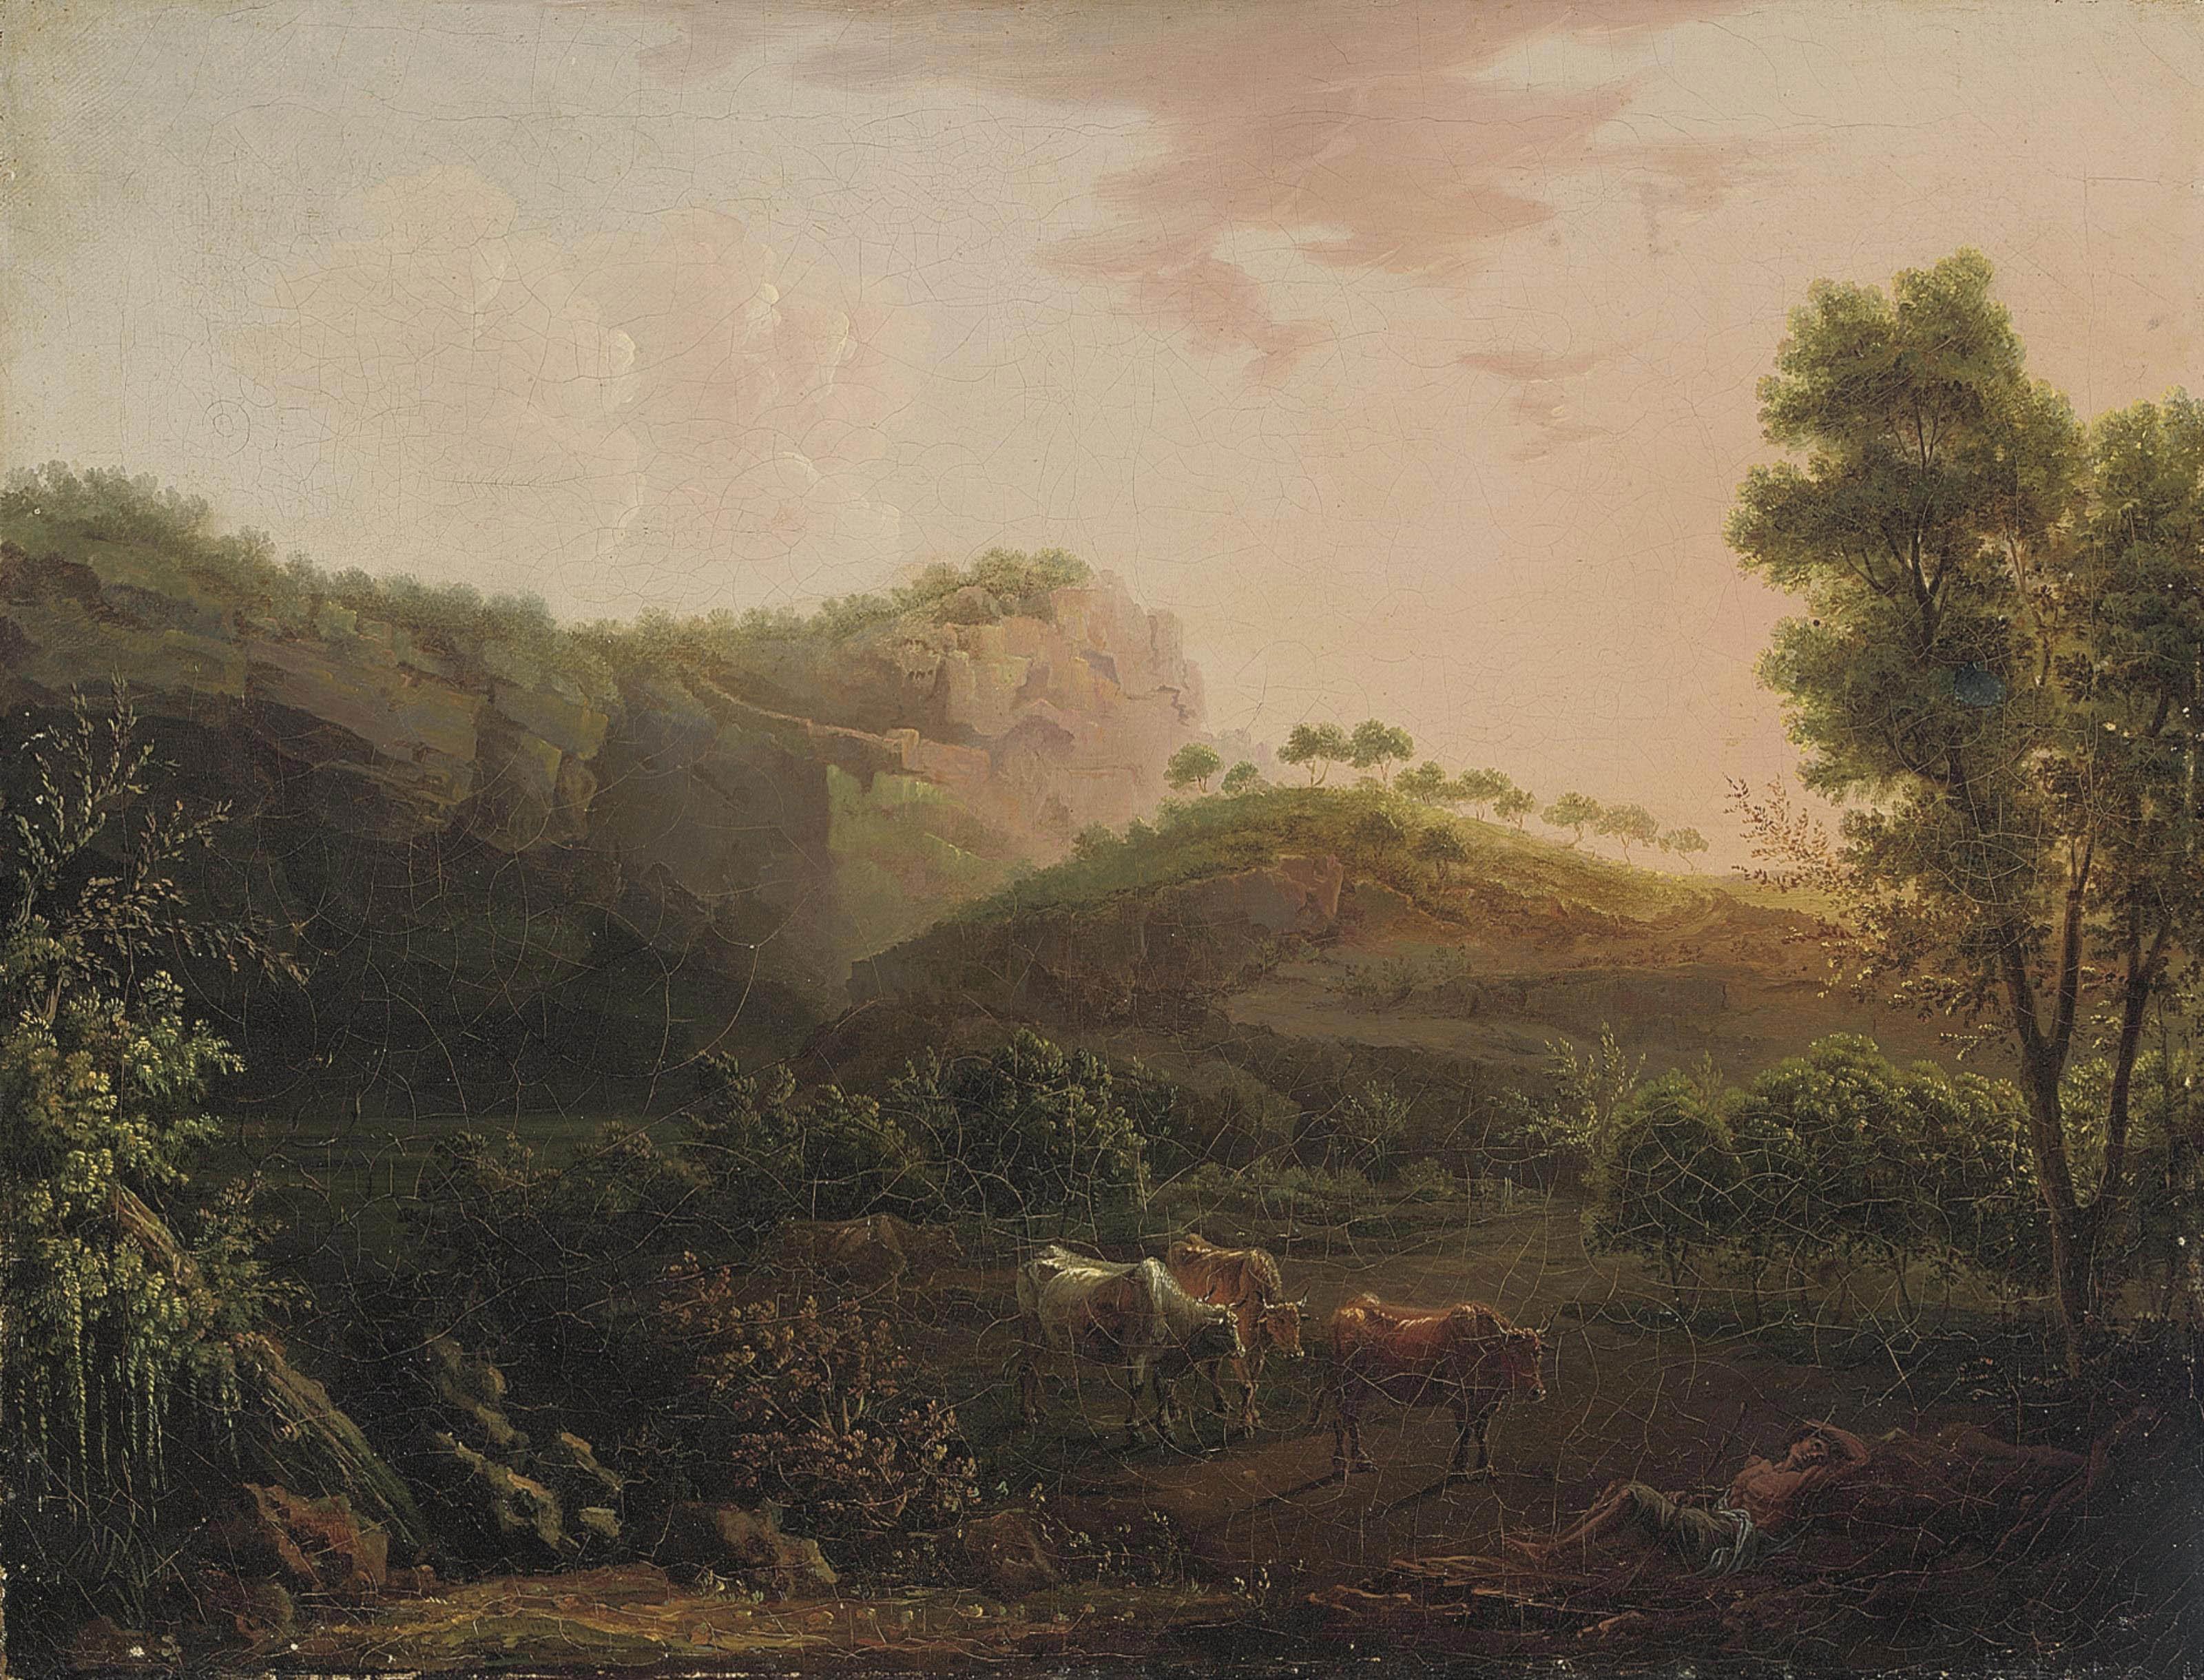 Dutch School, 18th Century | A wooded mountainous landscape